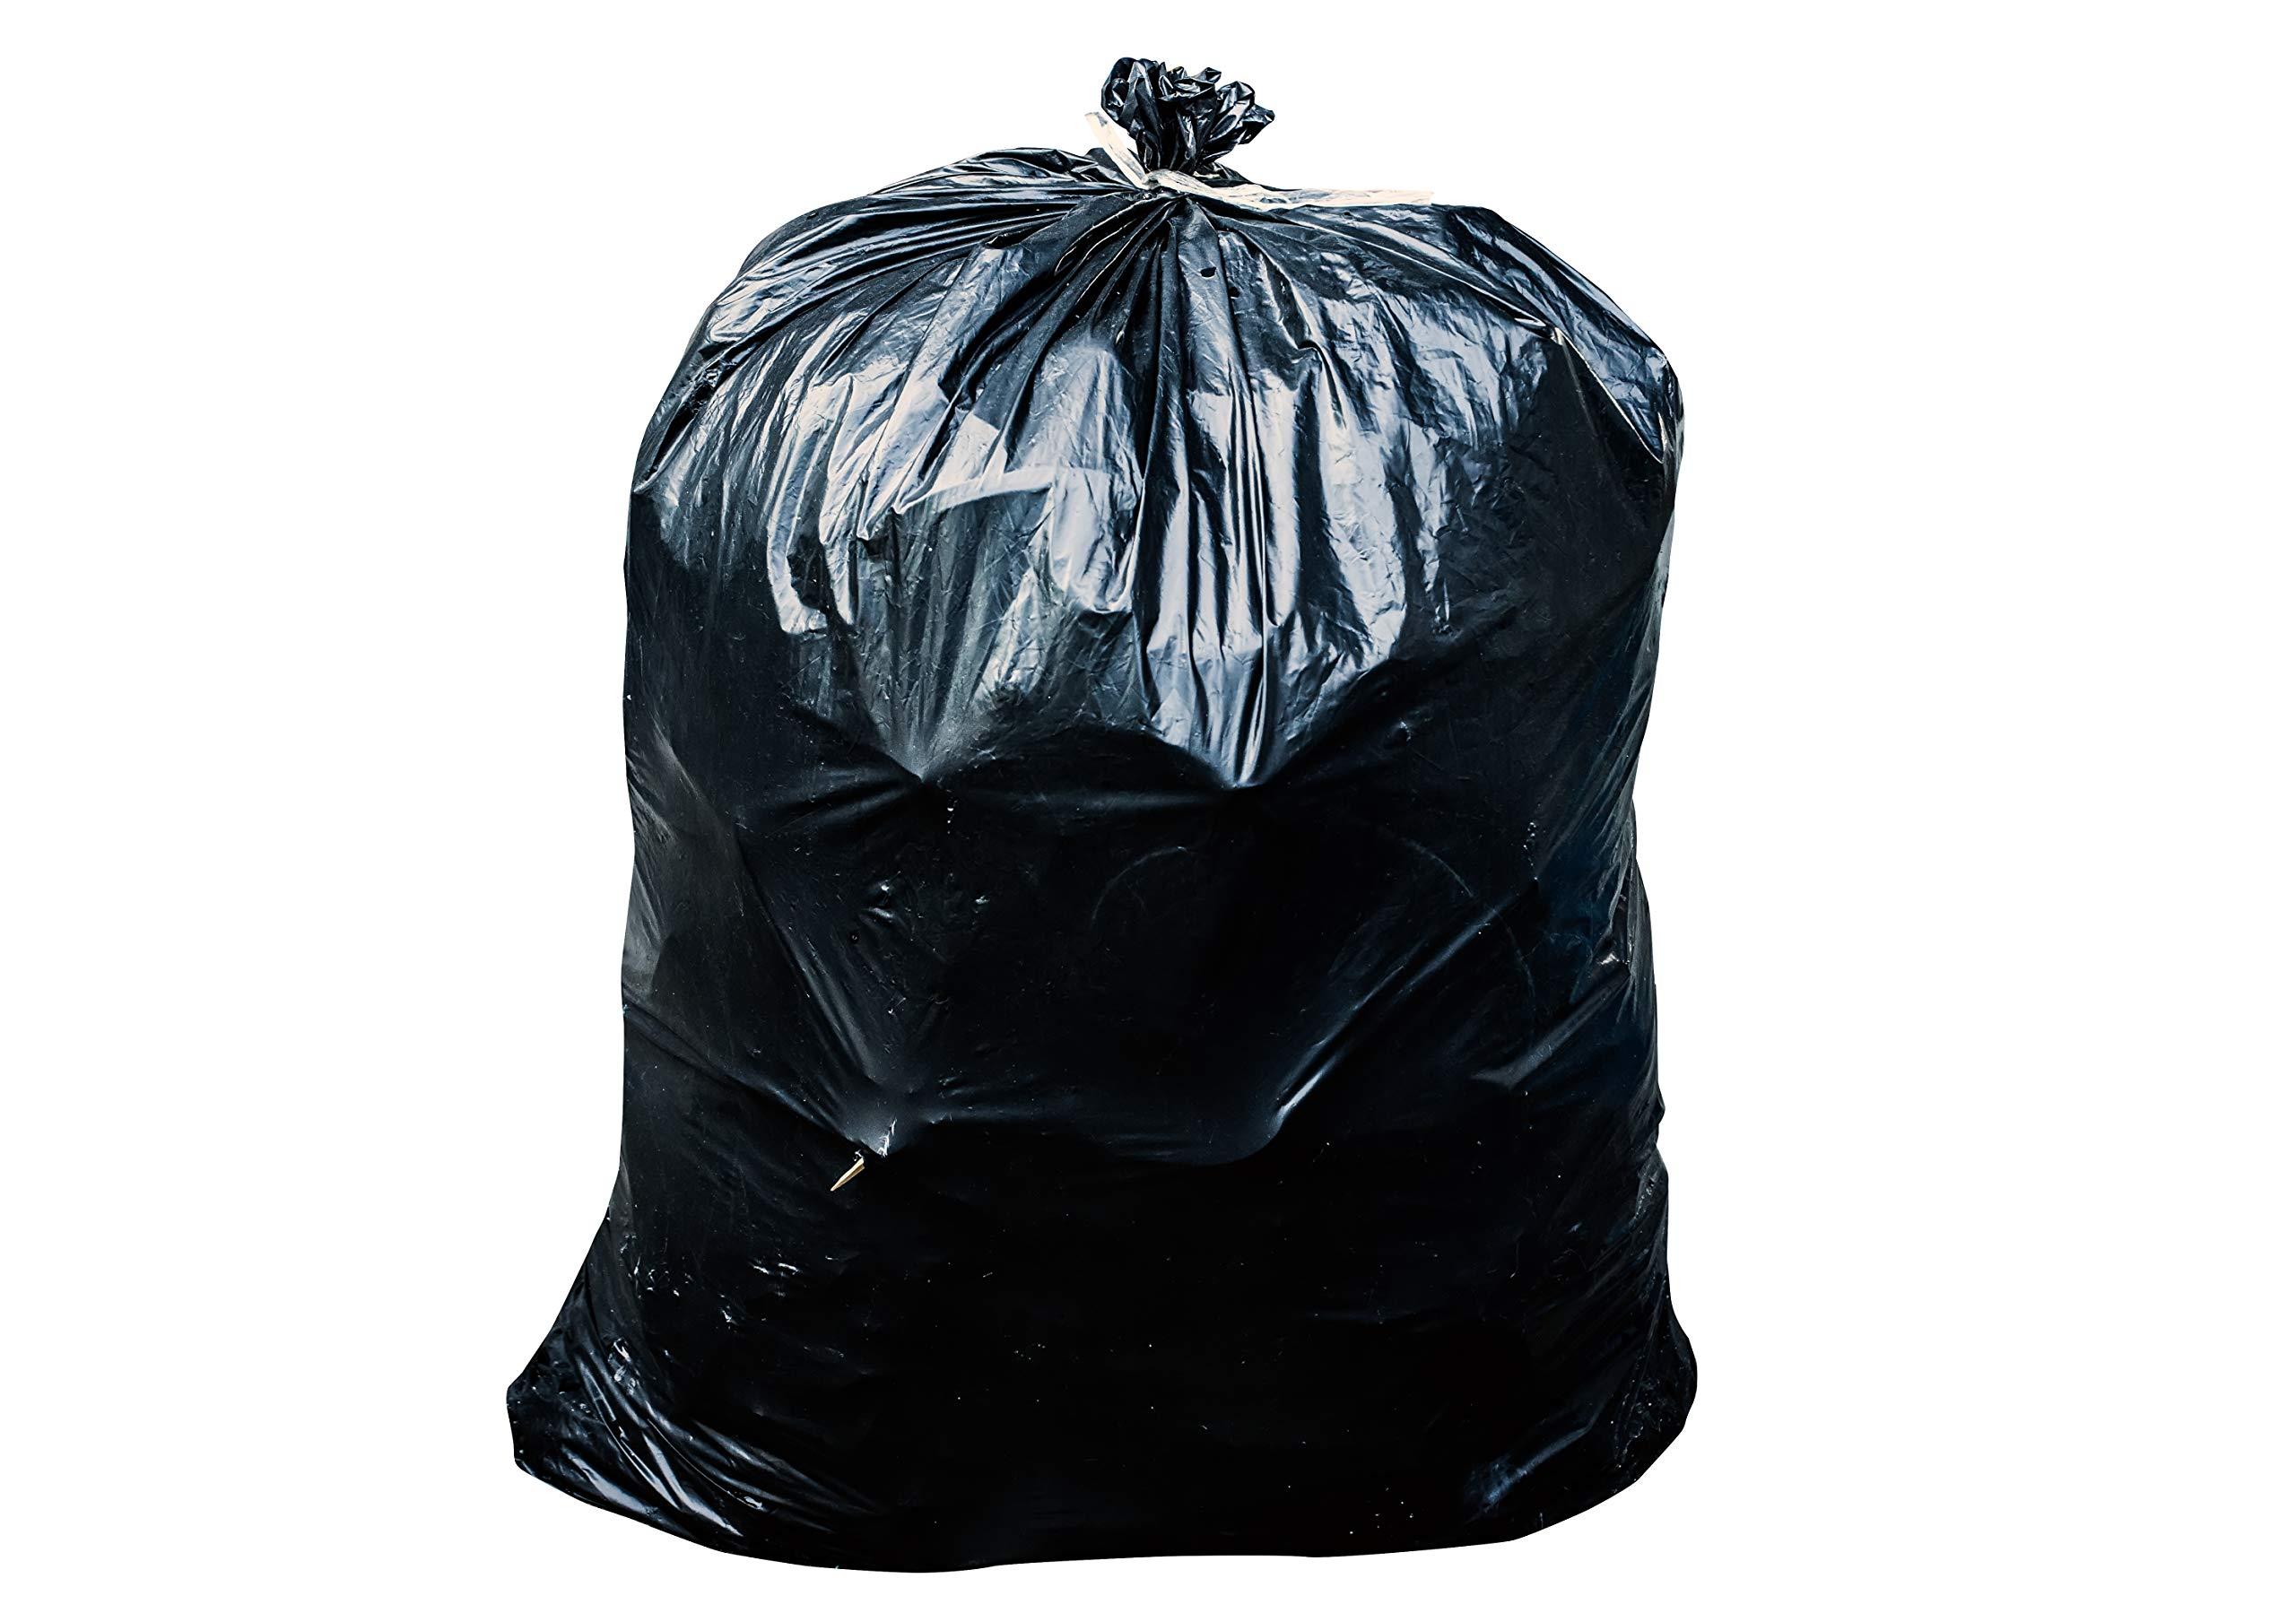 Toughbag 55-60 Gallon Contractor Trash Bags, 38''W x 58''H, 3.0 Mil (50, Black) by ToughBag